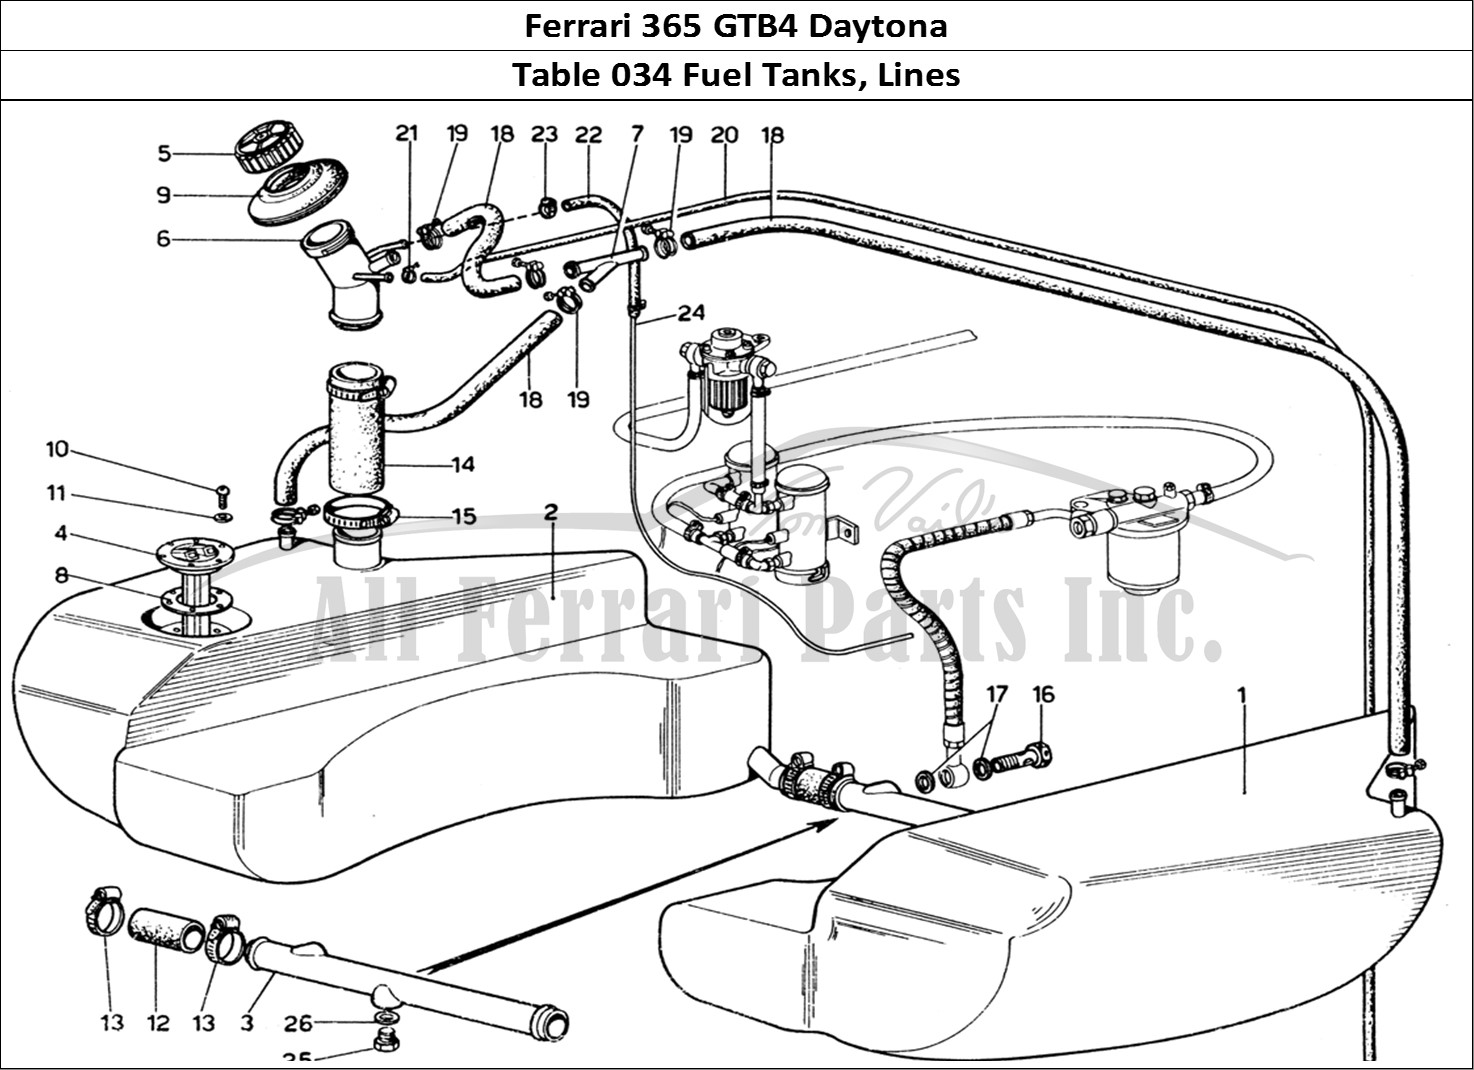 Buy Original Ferrari 365 Gtb4 Daytona 034 Fuel Tanks